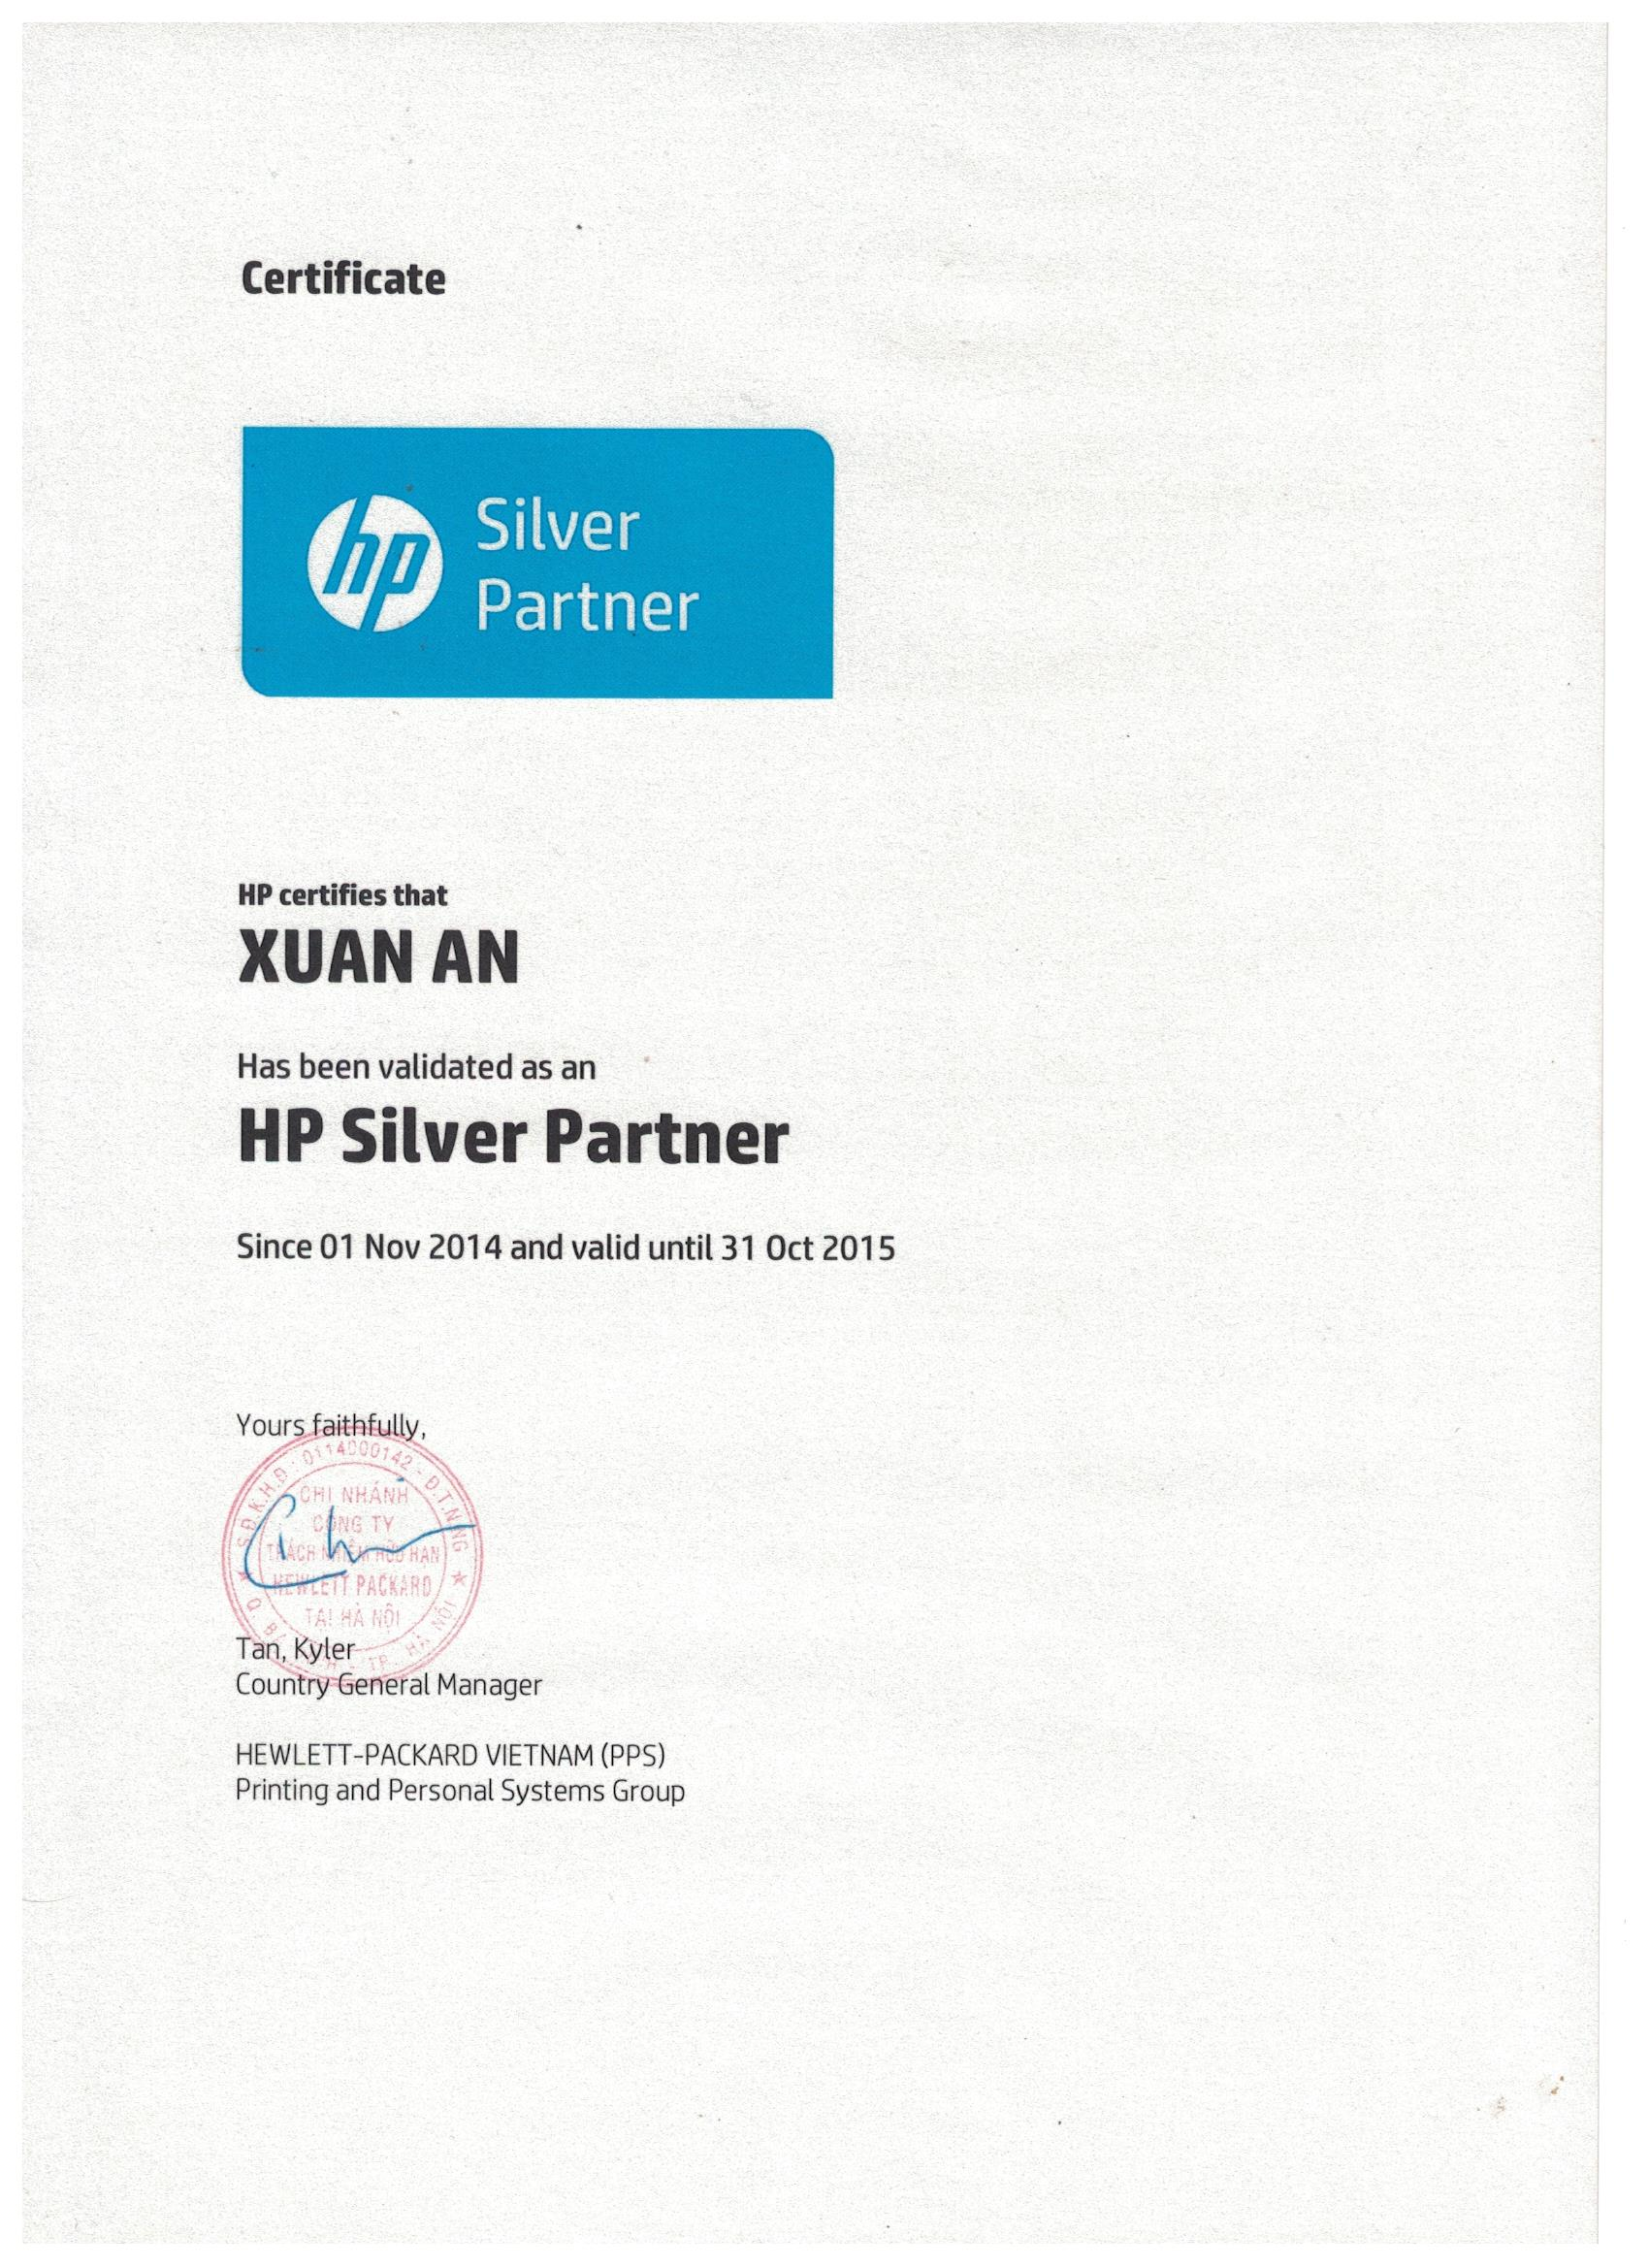 HP Probook 450 G7 - 9LA52PA (Silver)